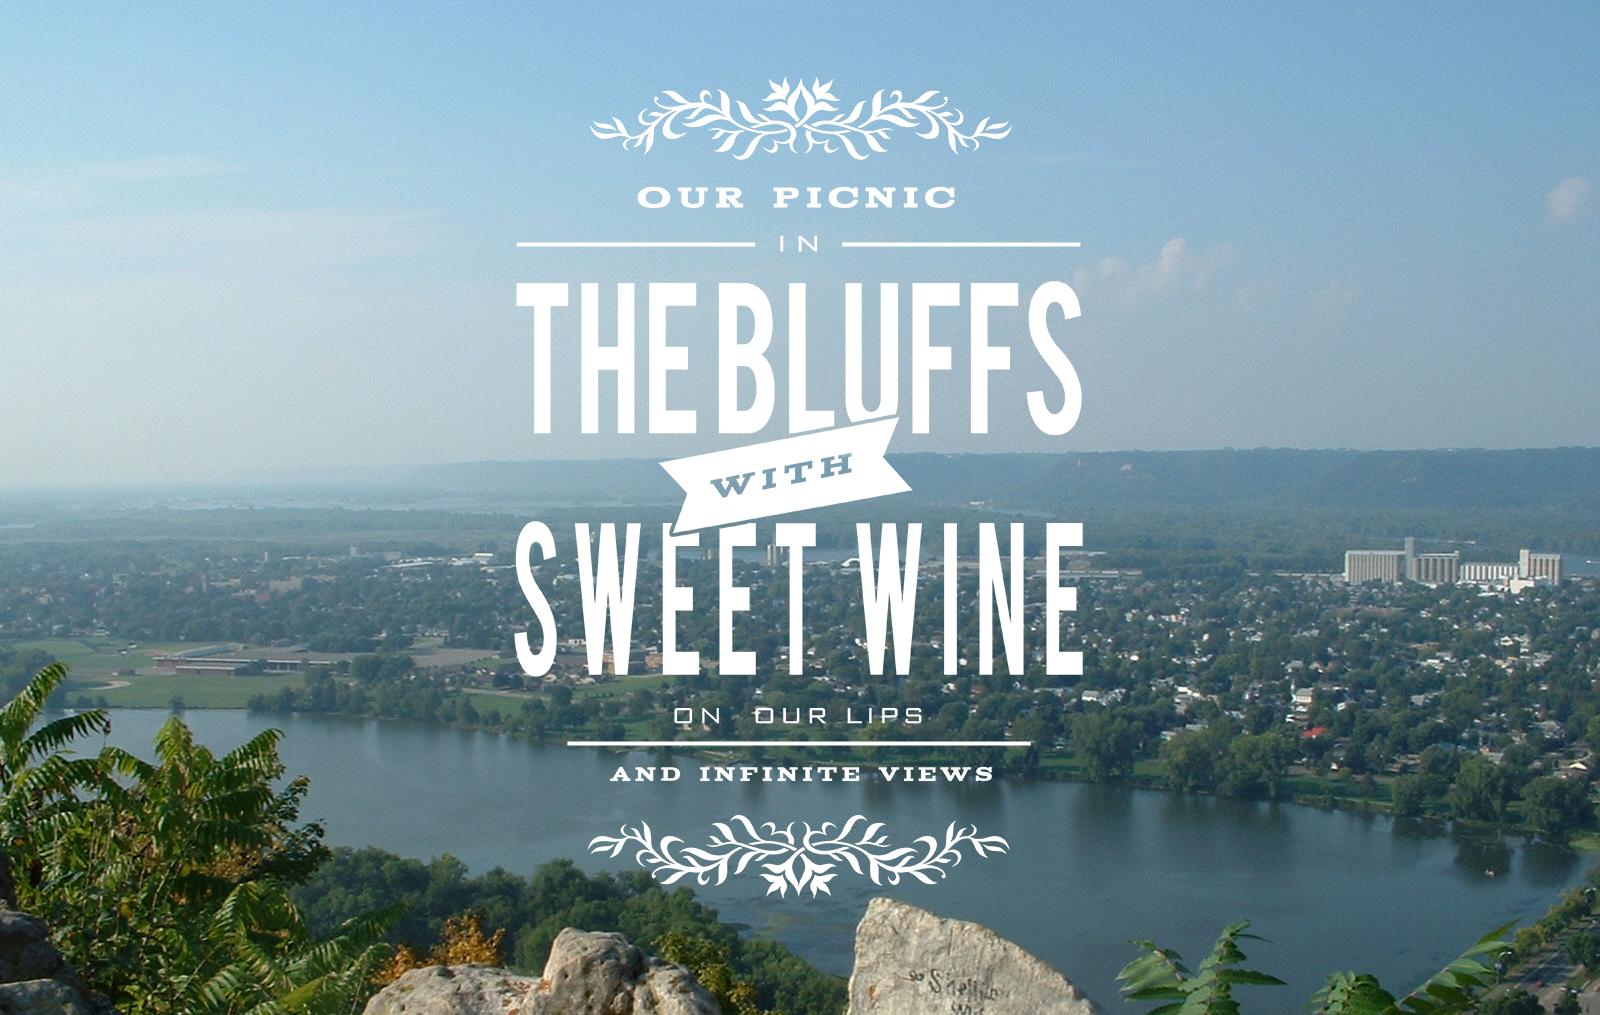 Bluffs_1.jpg